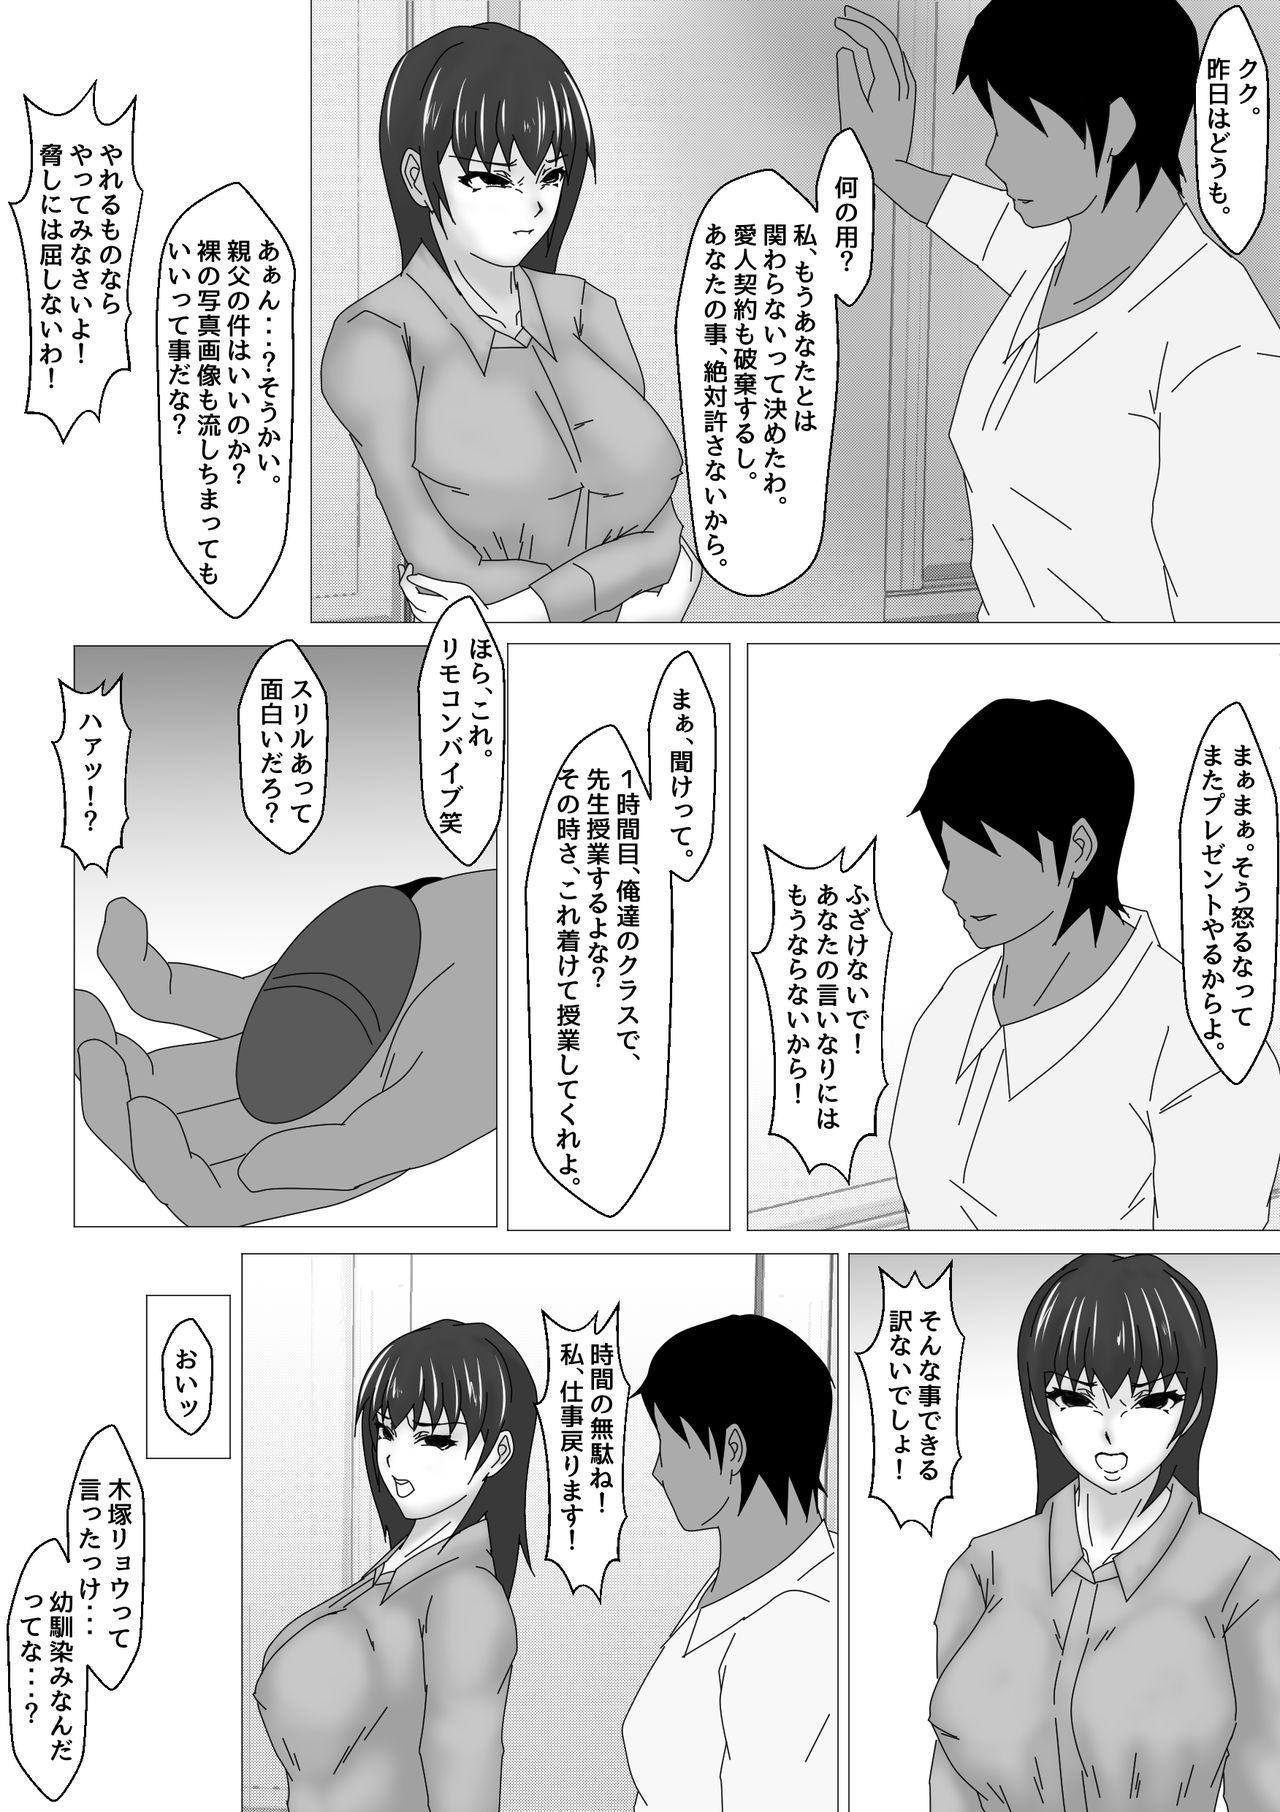 Jokyoushi Shinozaki Rin no Choukyou Kiroku Dai 3 Zenhan | Female Teacher Rin Shinozaki's Training Record 3 First Half 12